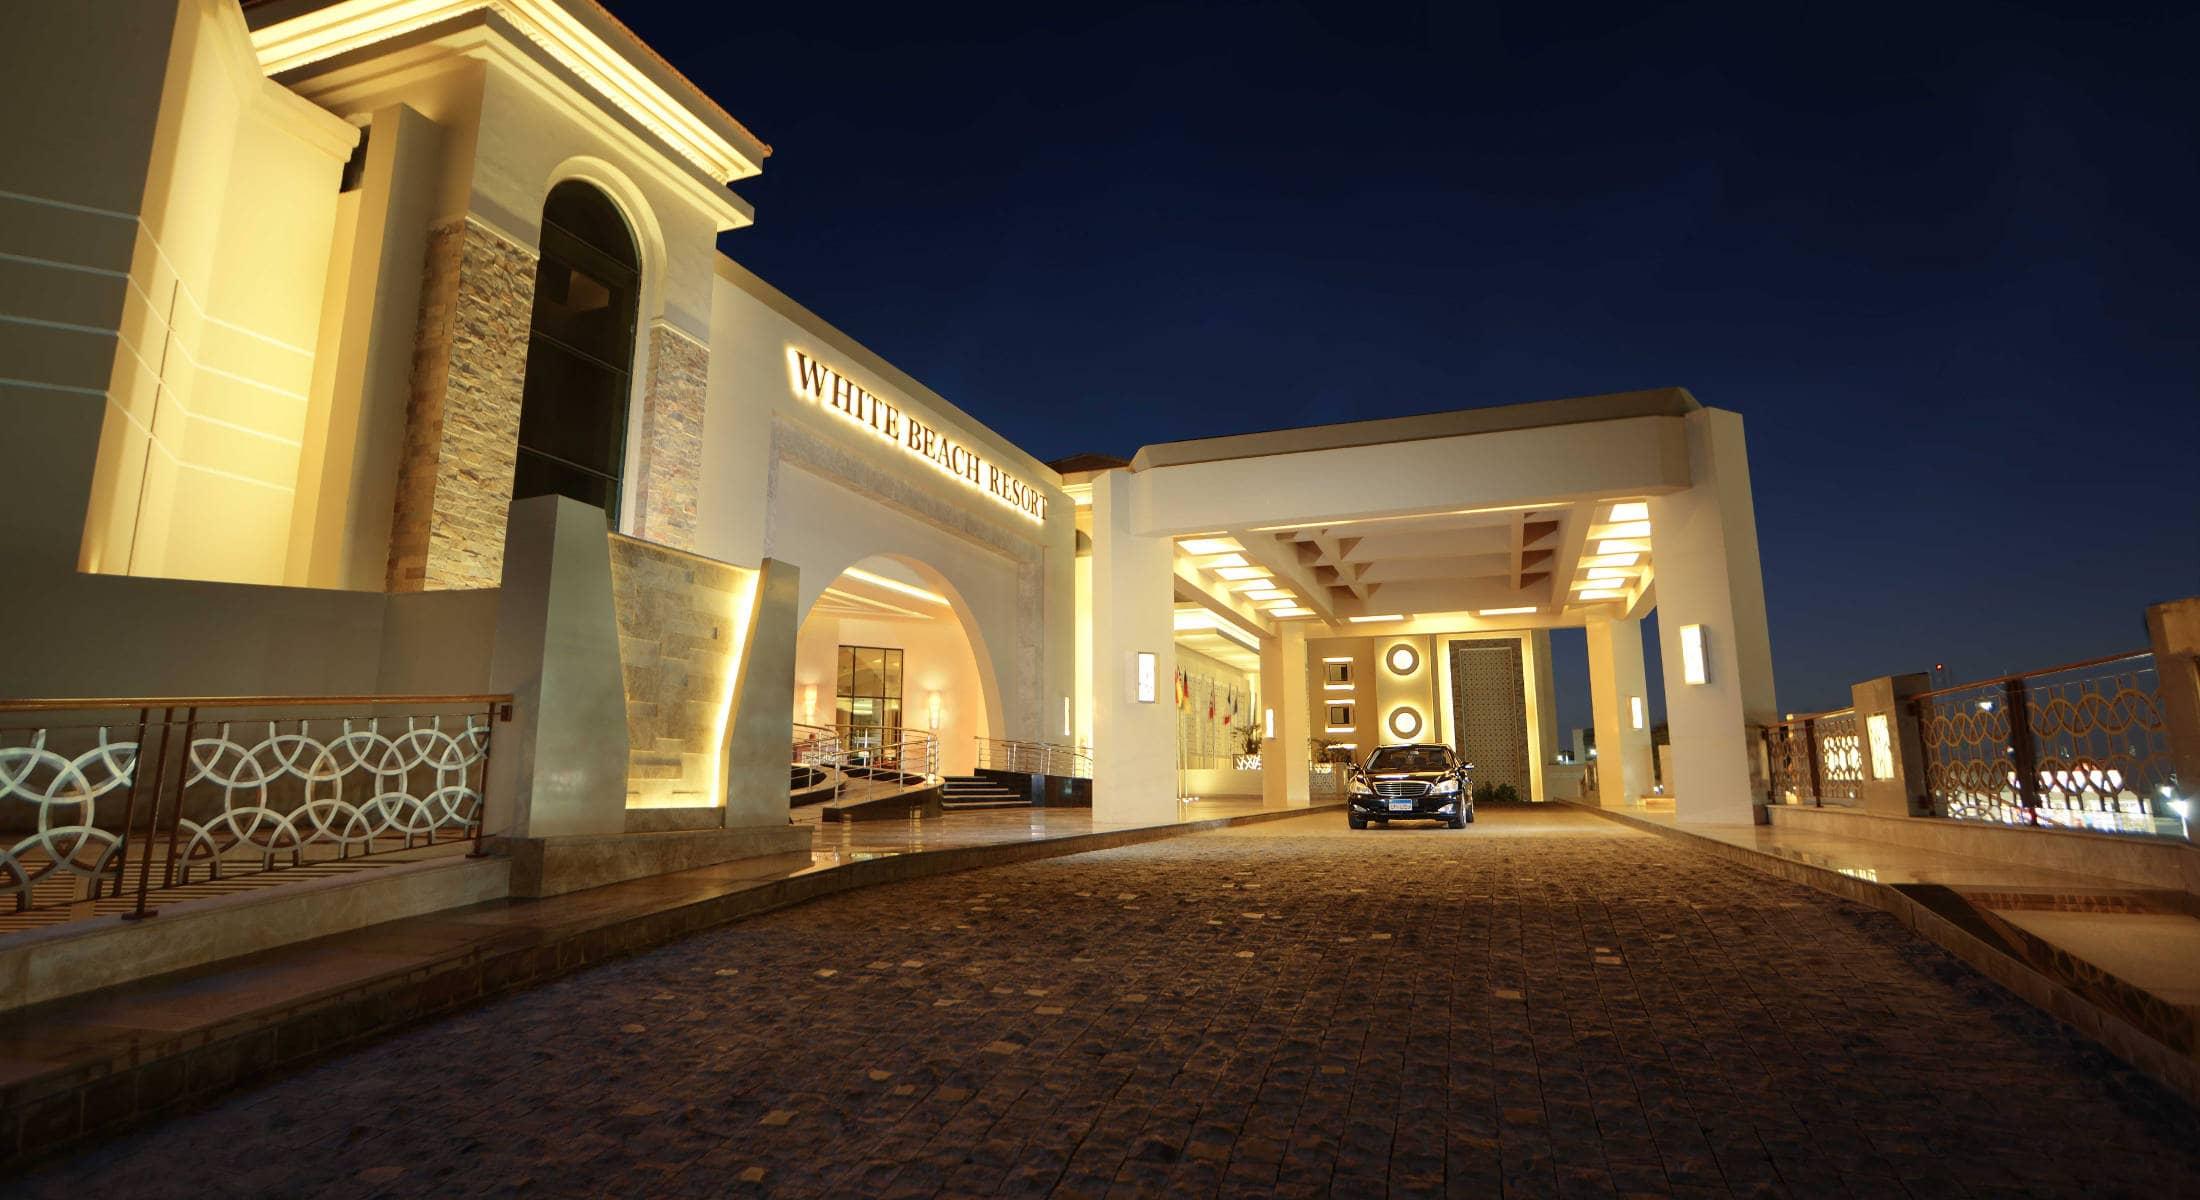 albatros white beach gallery pickalbatros hotels. Black Bedroom Furniture Sets. Home Design Ideas